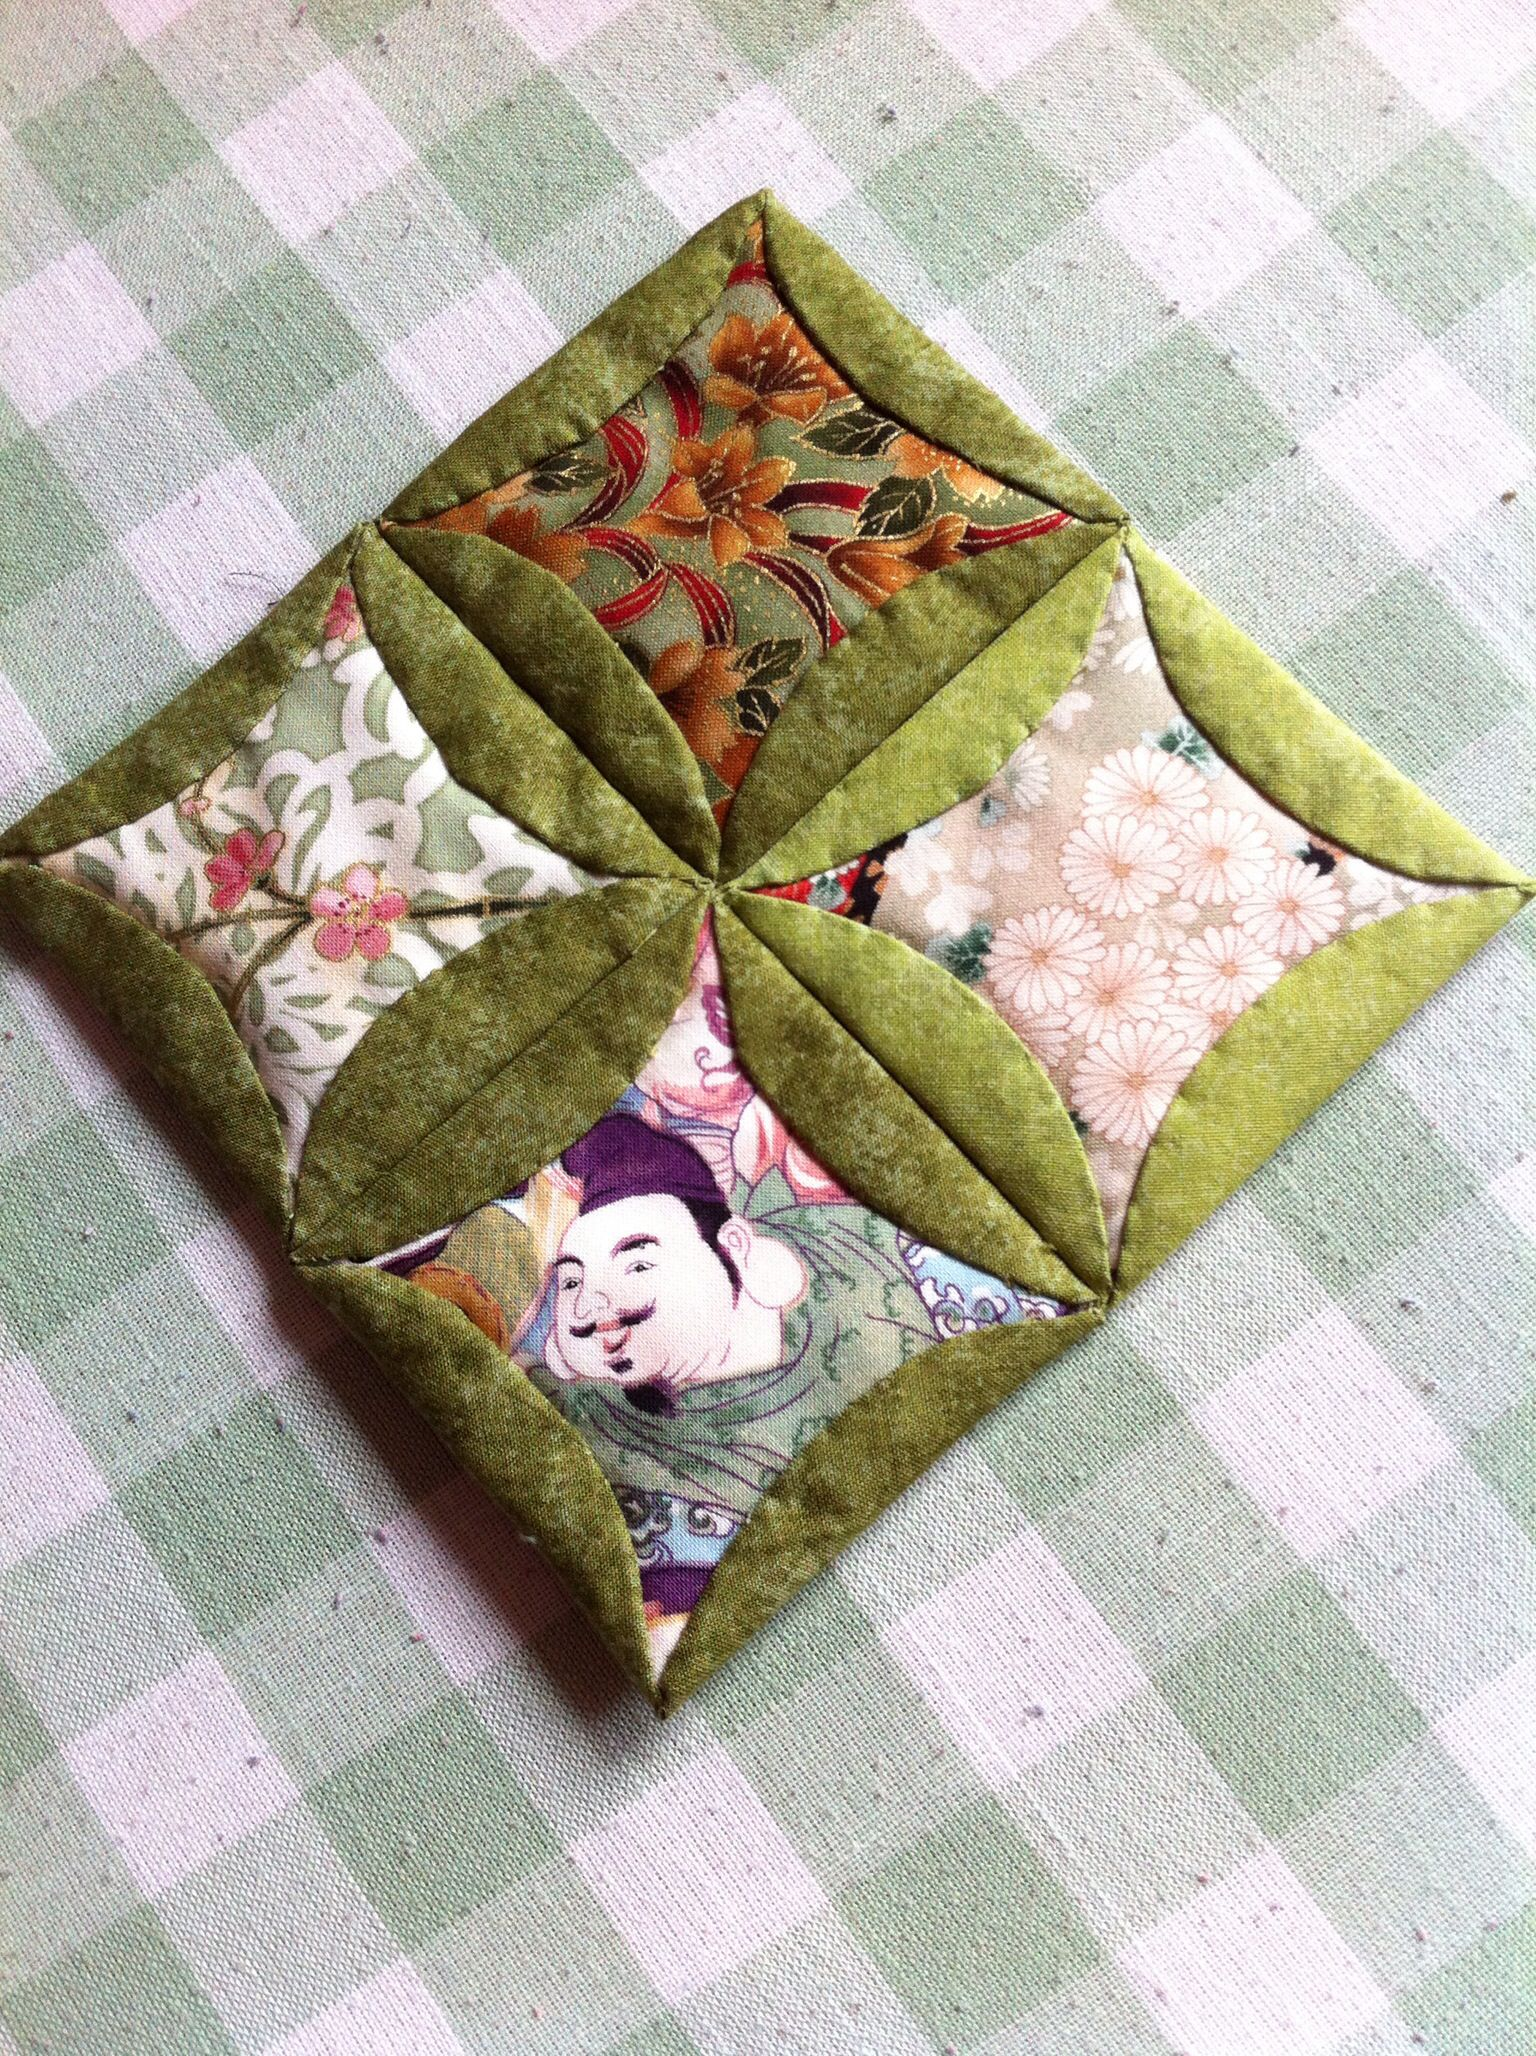 Japanese folded patchwork Sample made for demonstration of